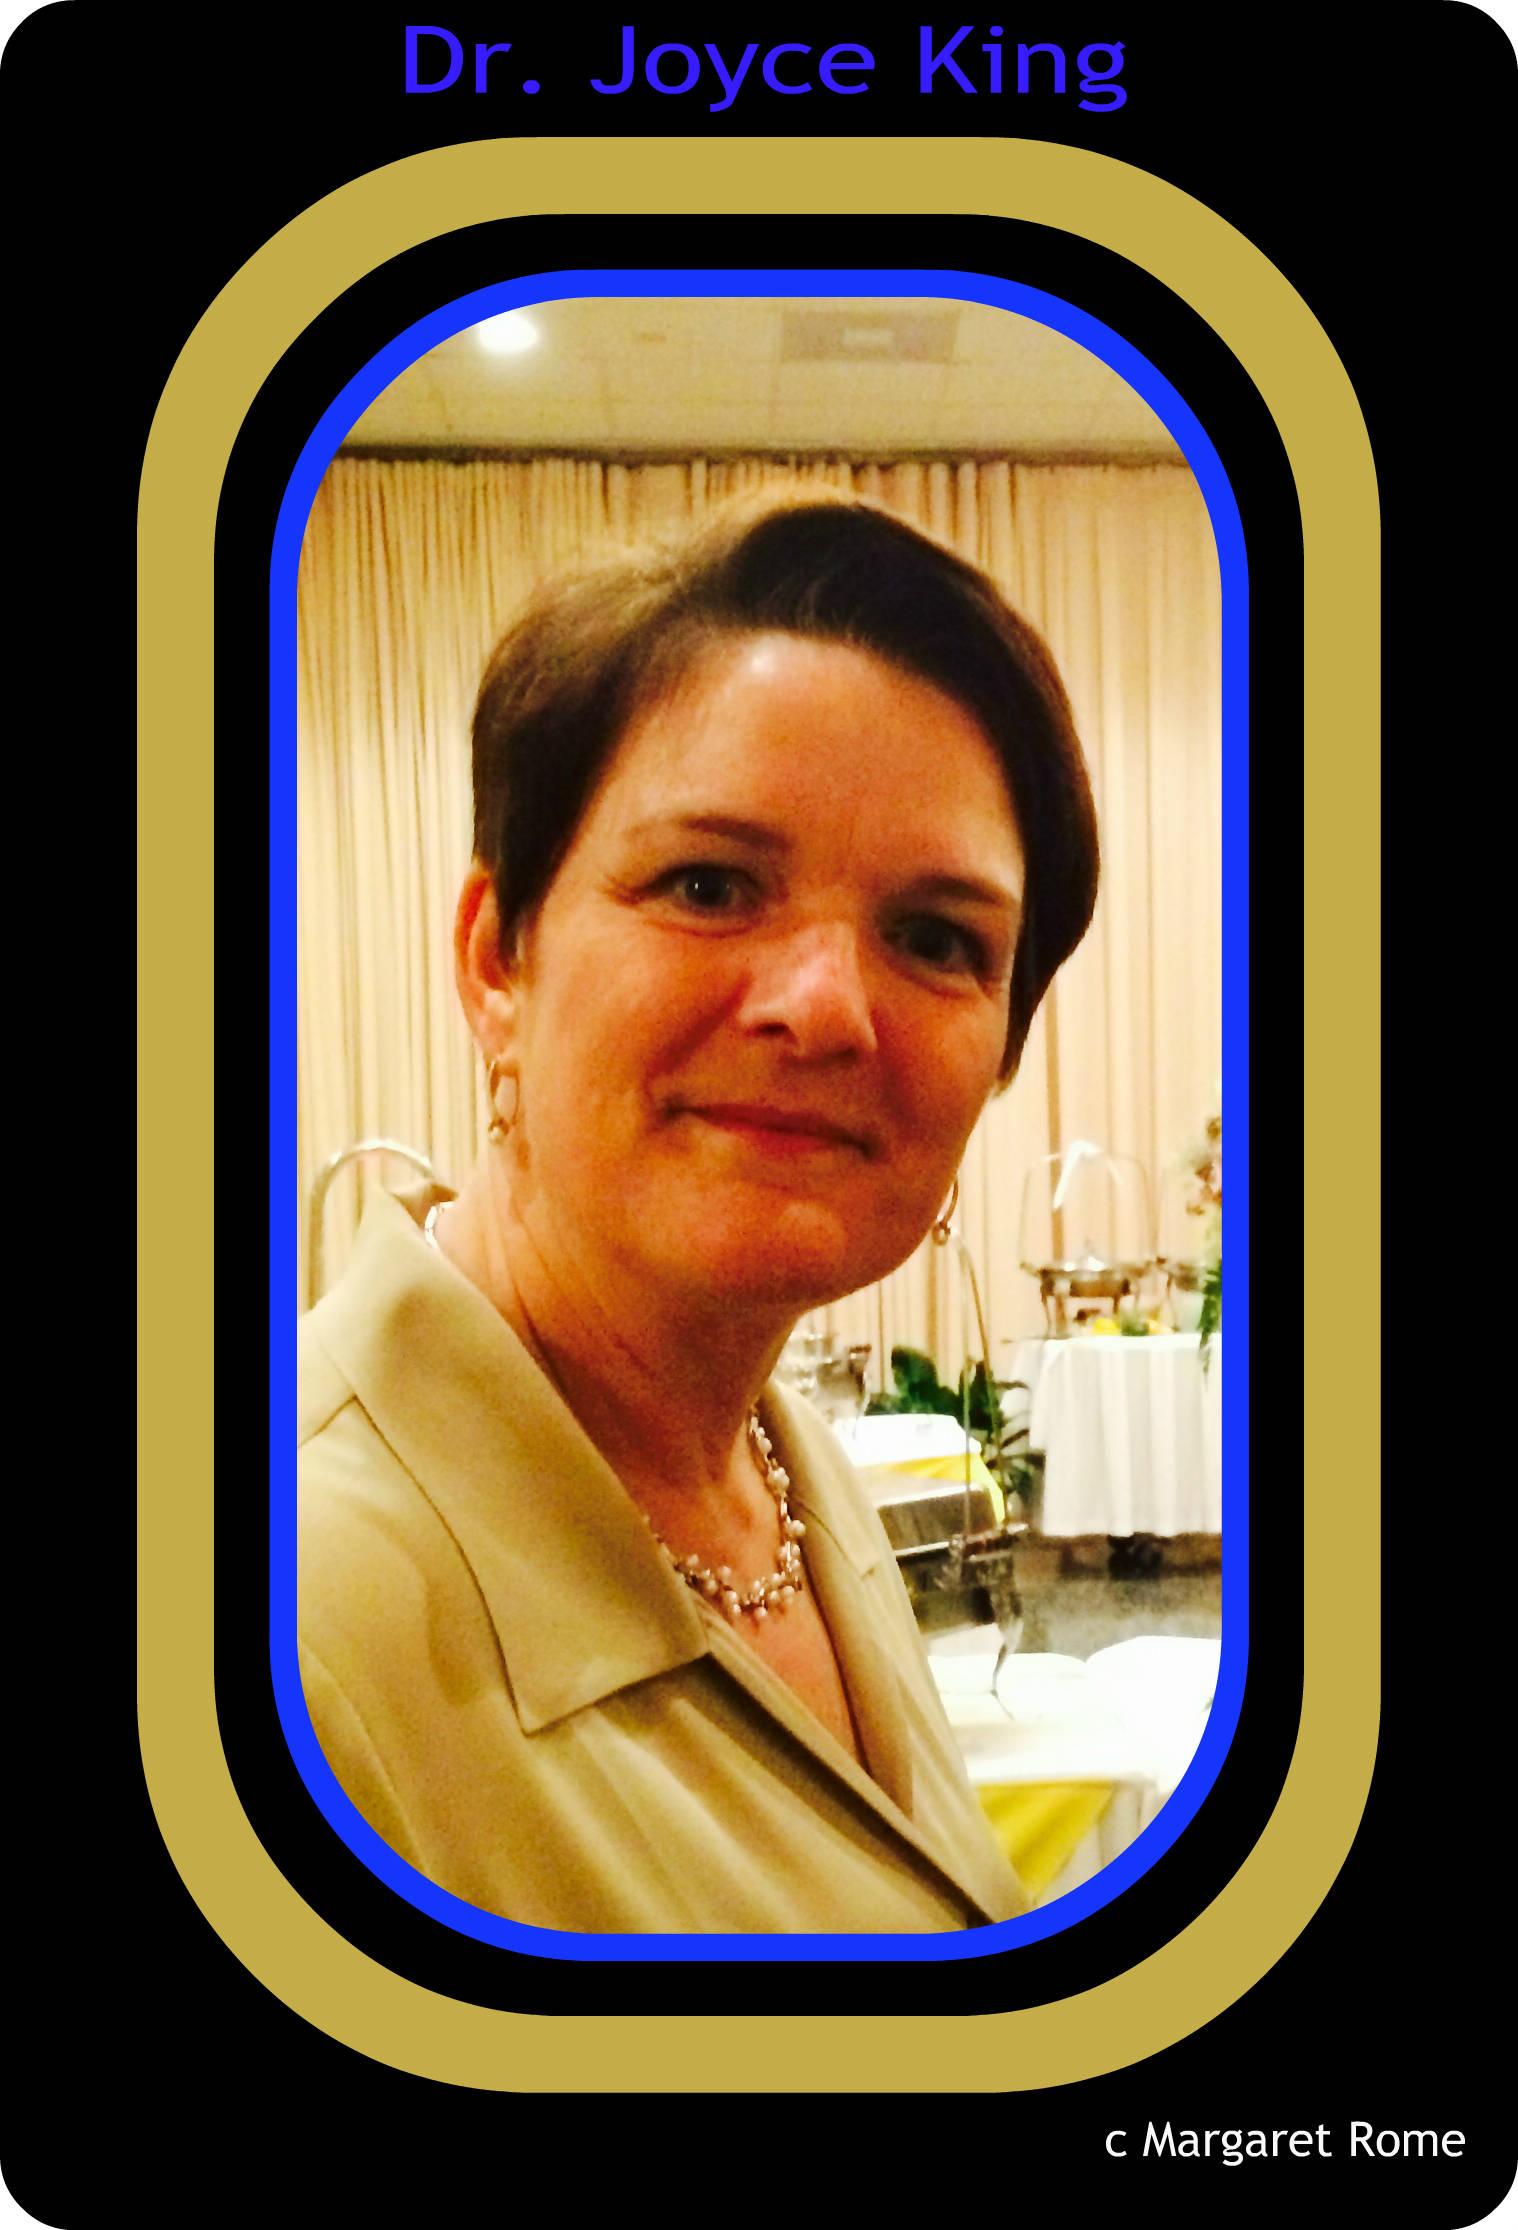 Dr. Joyce King